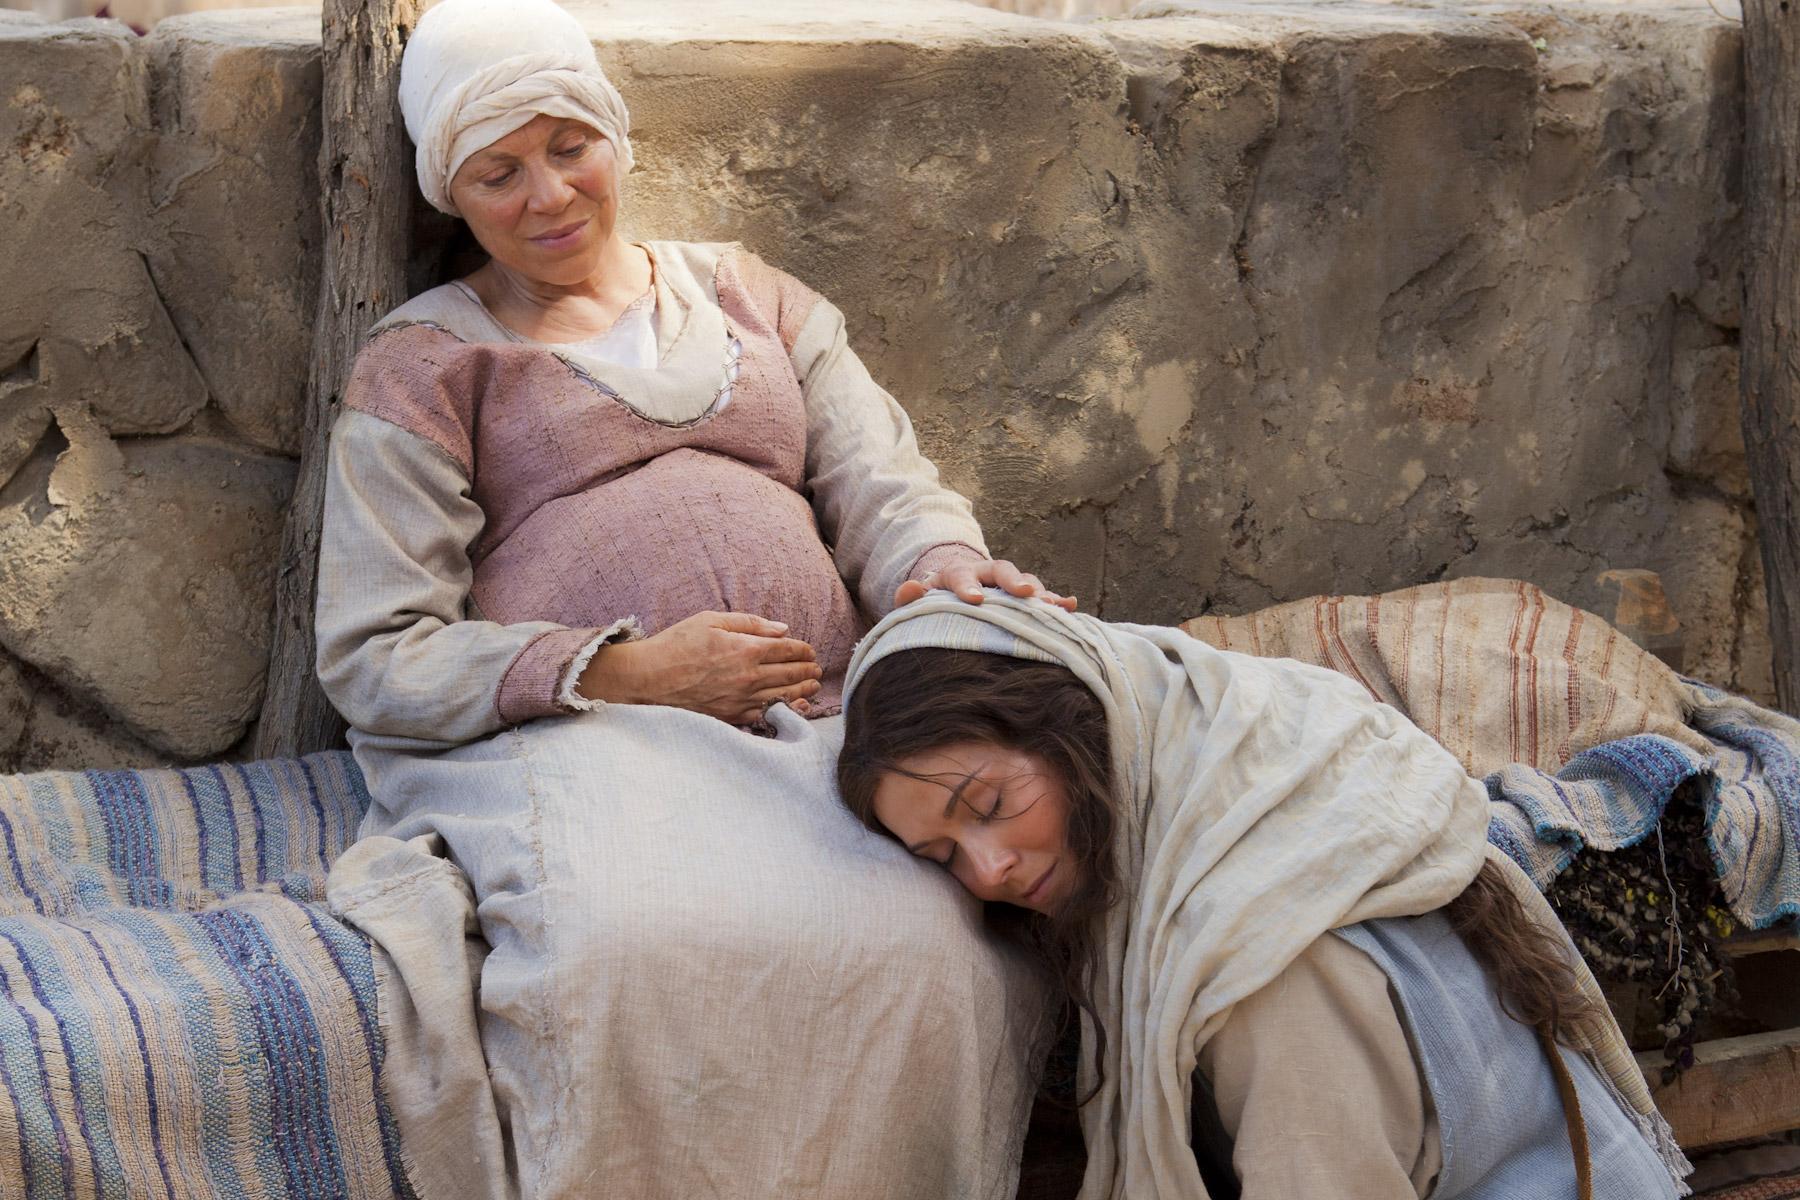 Nativity Joseph And Mary Journey To Bethlehem Story For Kids